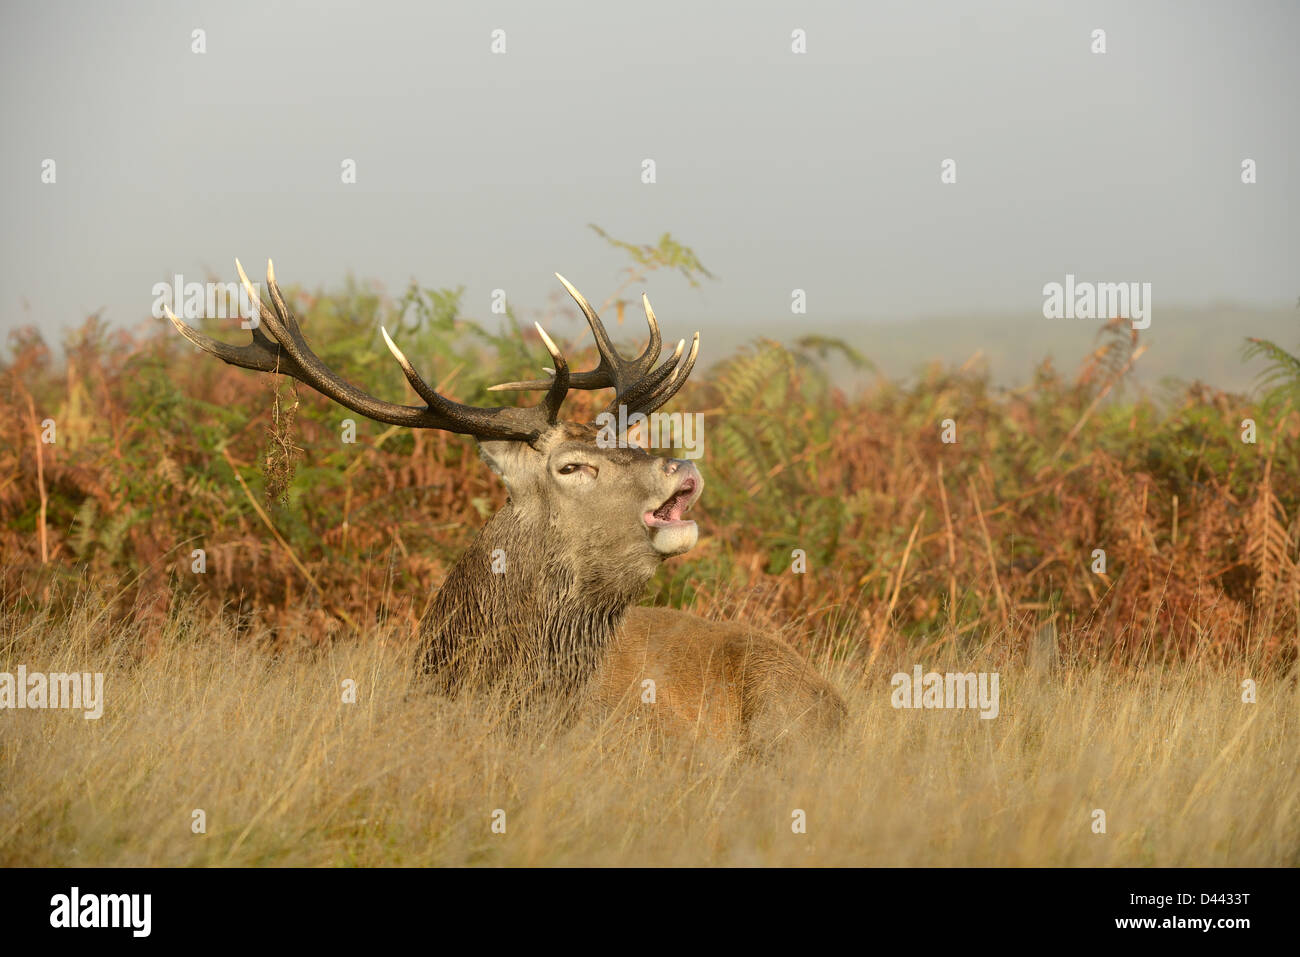 Red Deer (Cervus elaphus) stag sitting in long grass roaring, Richmond Park, England, October - Stock Image